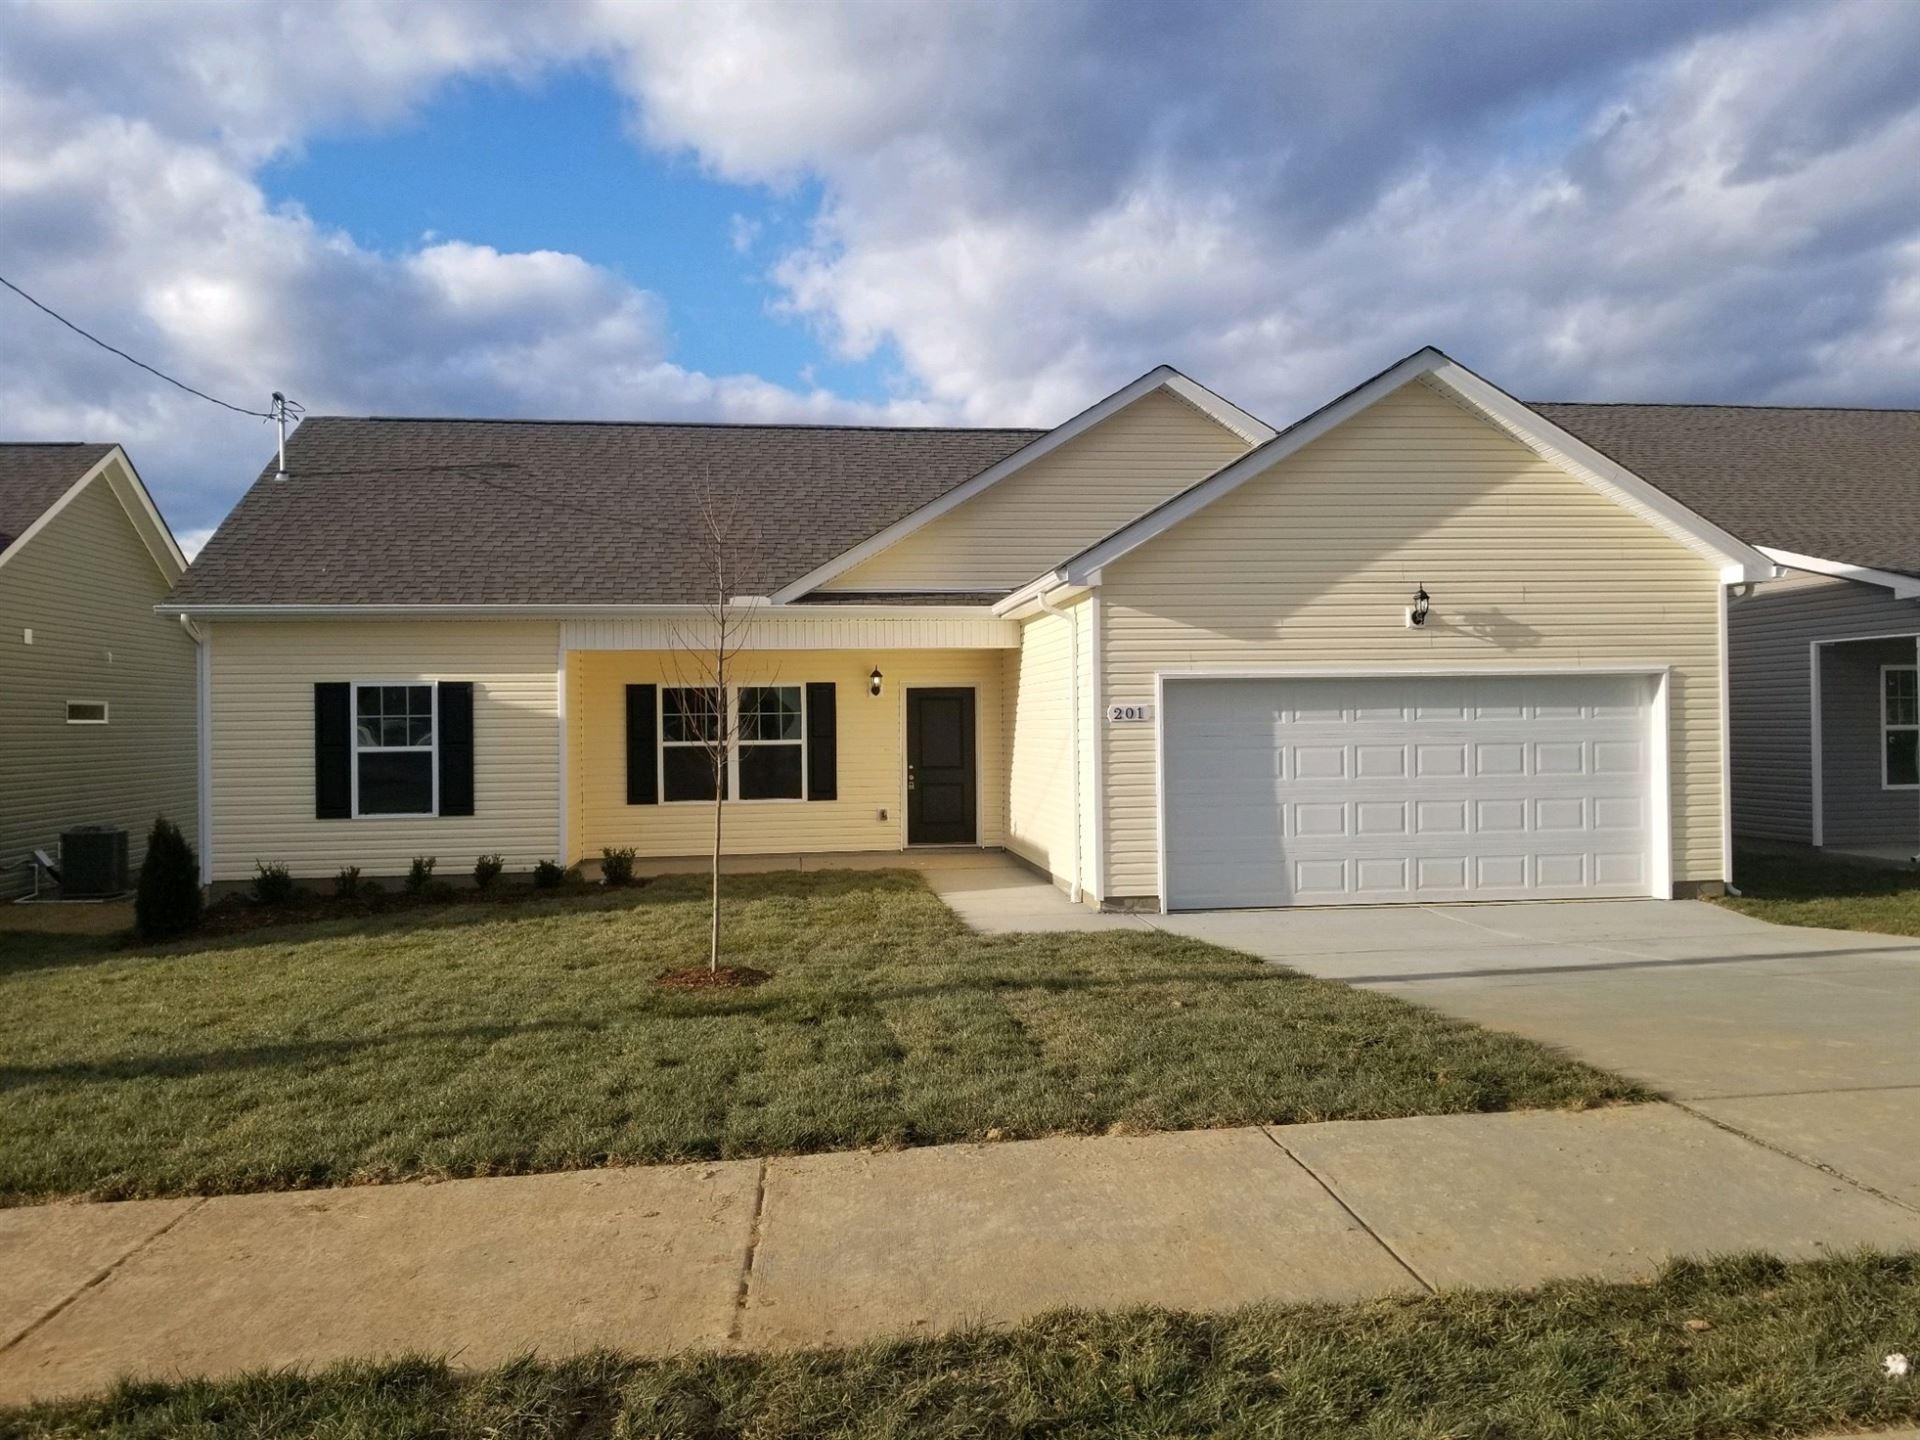 201 Equestrian Way, Shelbyville, TN 37160 - MLS#: 2203763